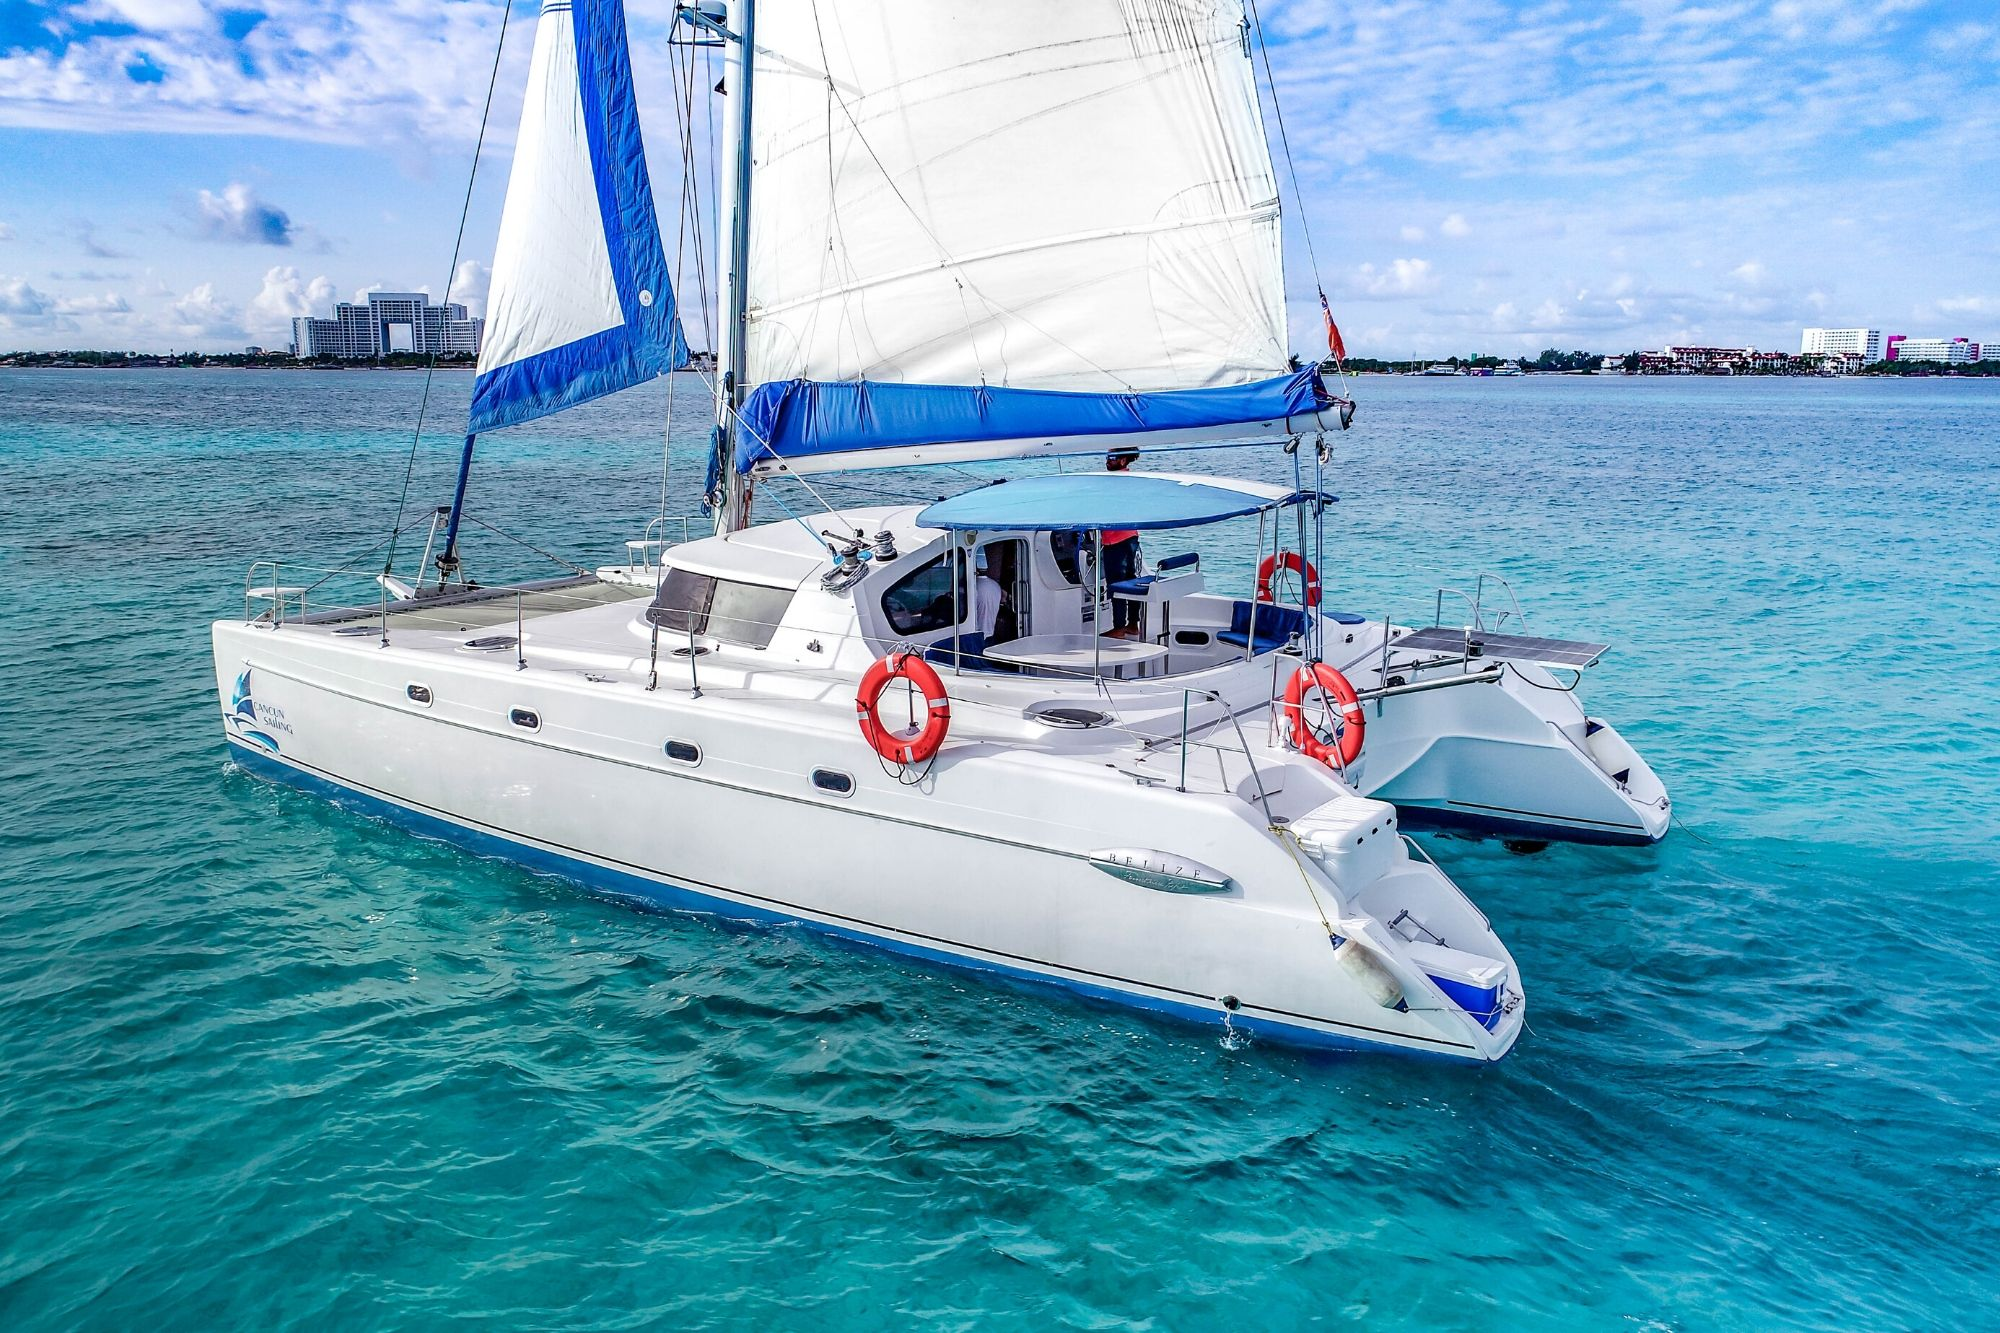 4 Vents - Isla Mujeres Catamaran Tour - Cancun Sailing 2